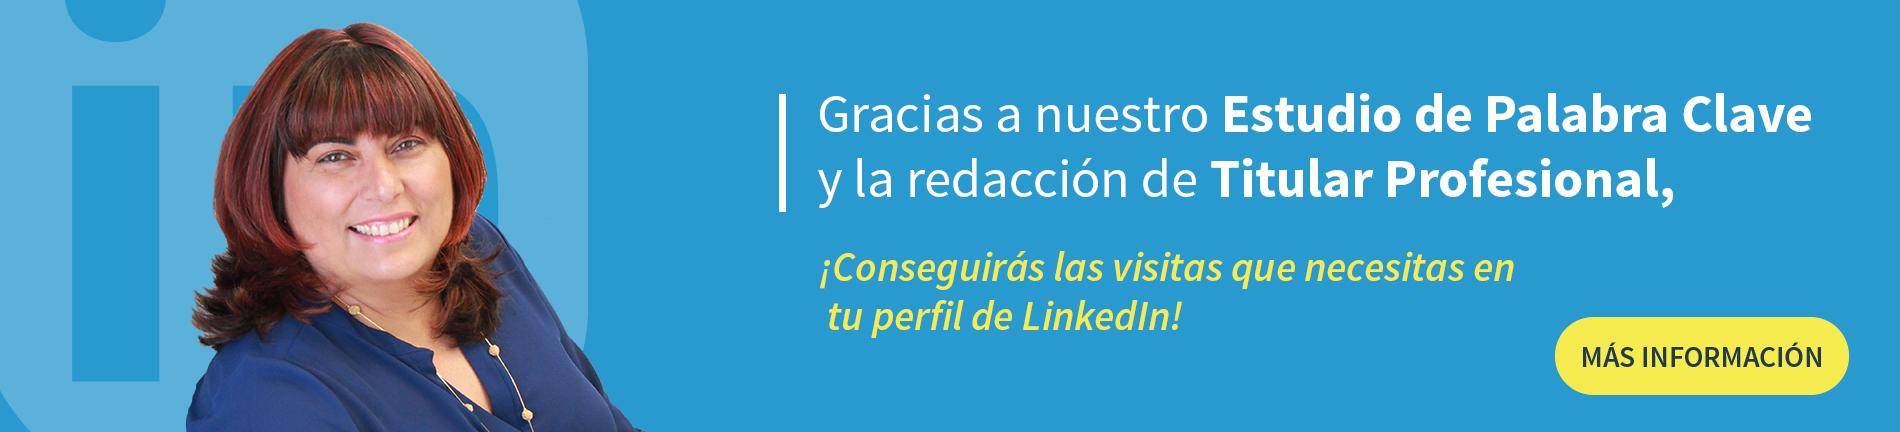 titular professional LinkedIn